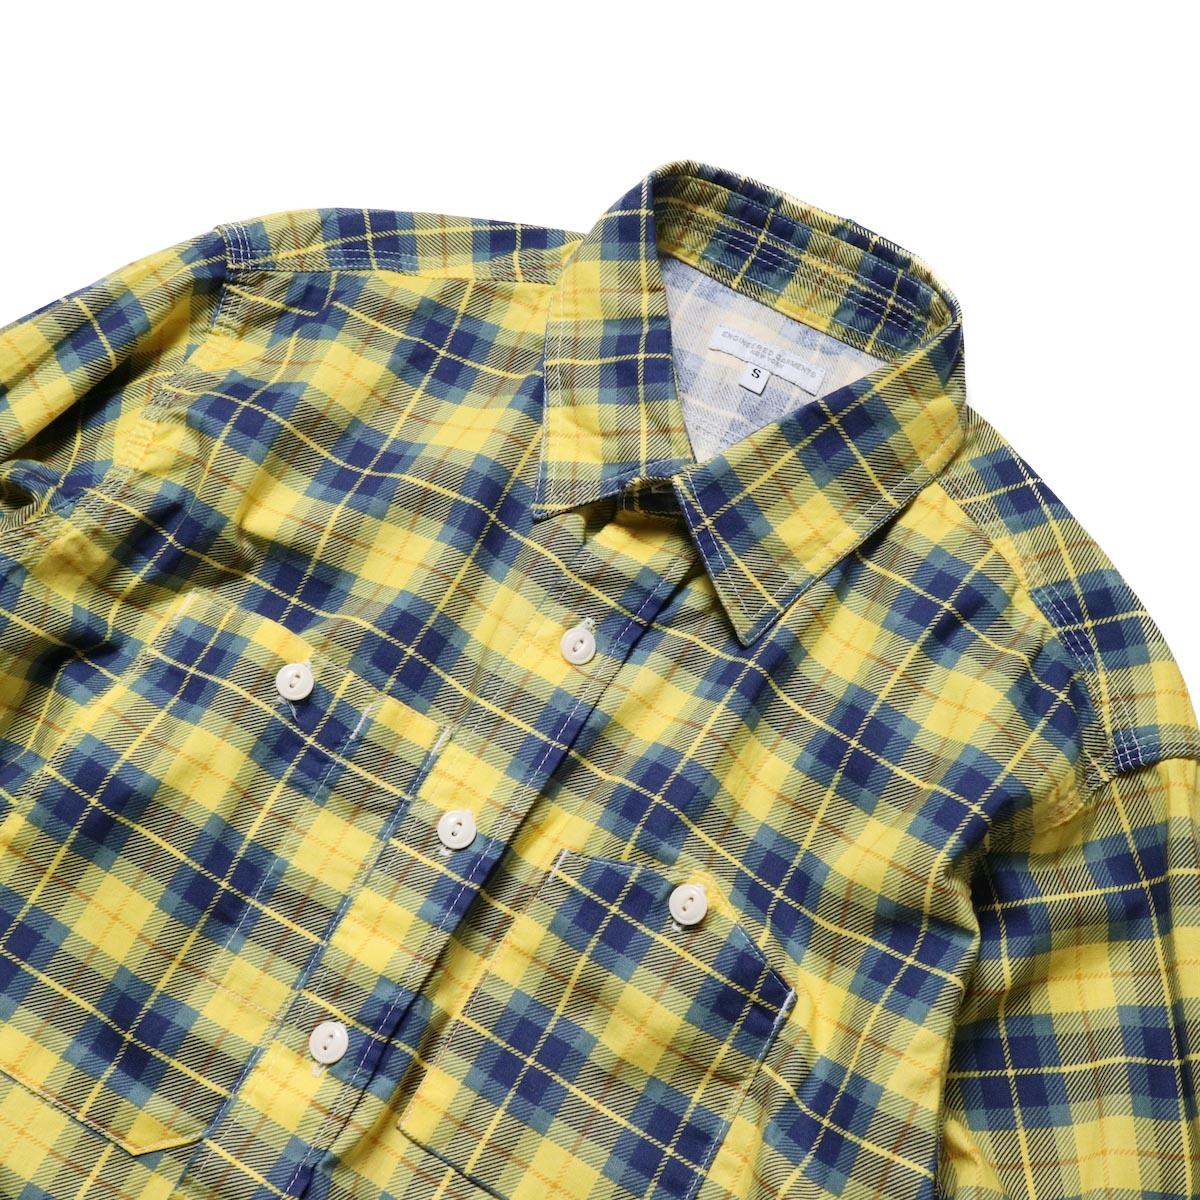 Engineered Garments / Work Shirt -Cotton Printed Plaid (Yellow)襟